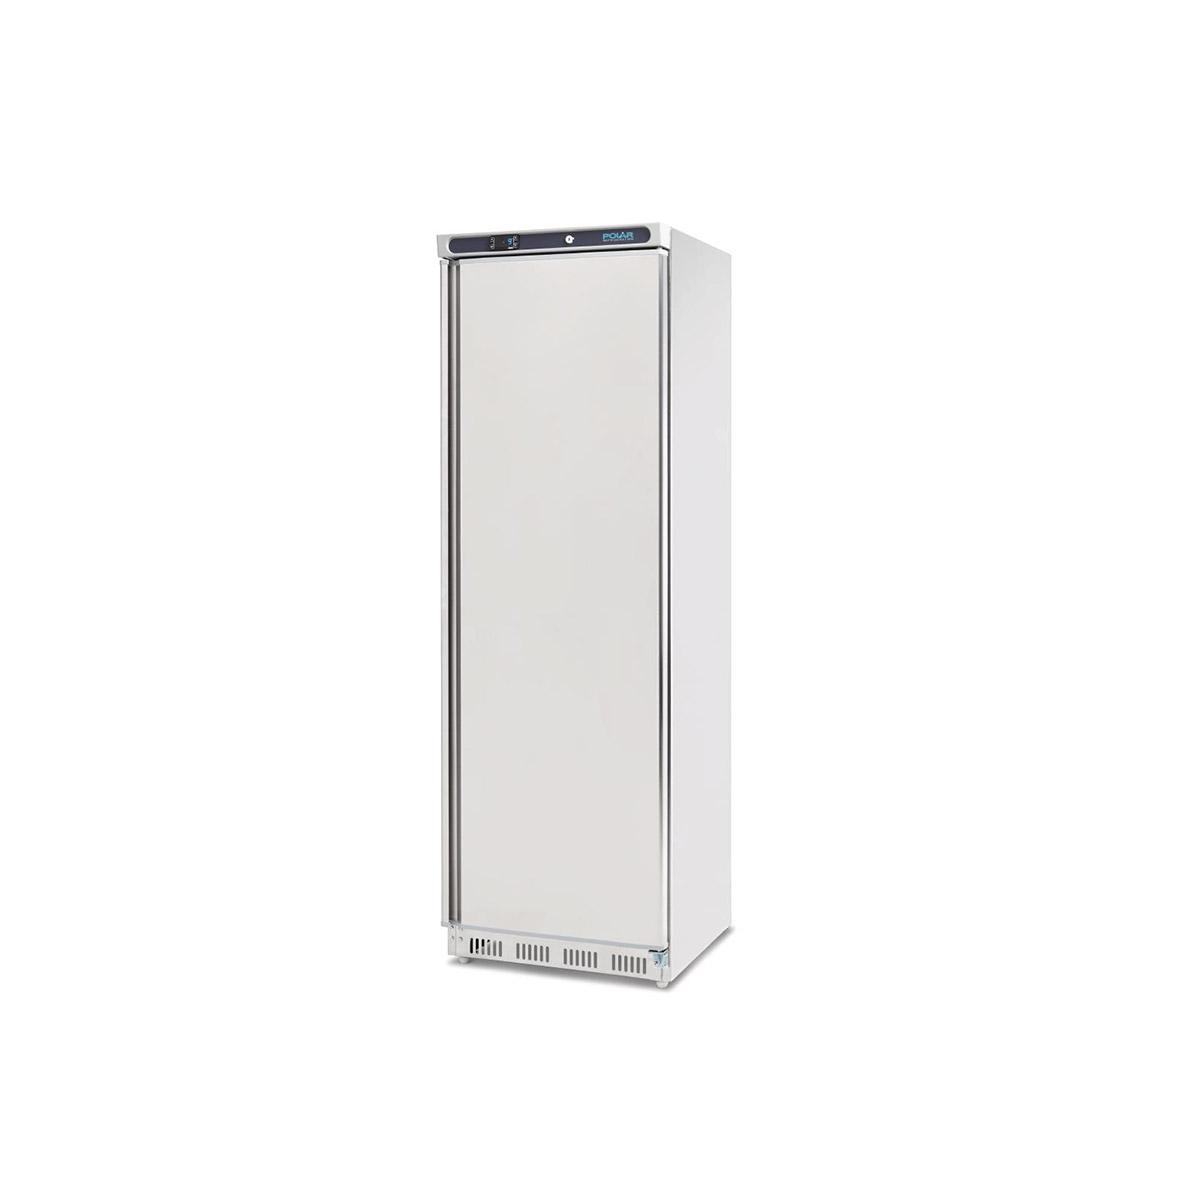 Polar C-Series Upright Freezer 365Ltr